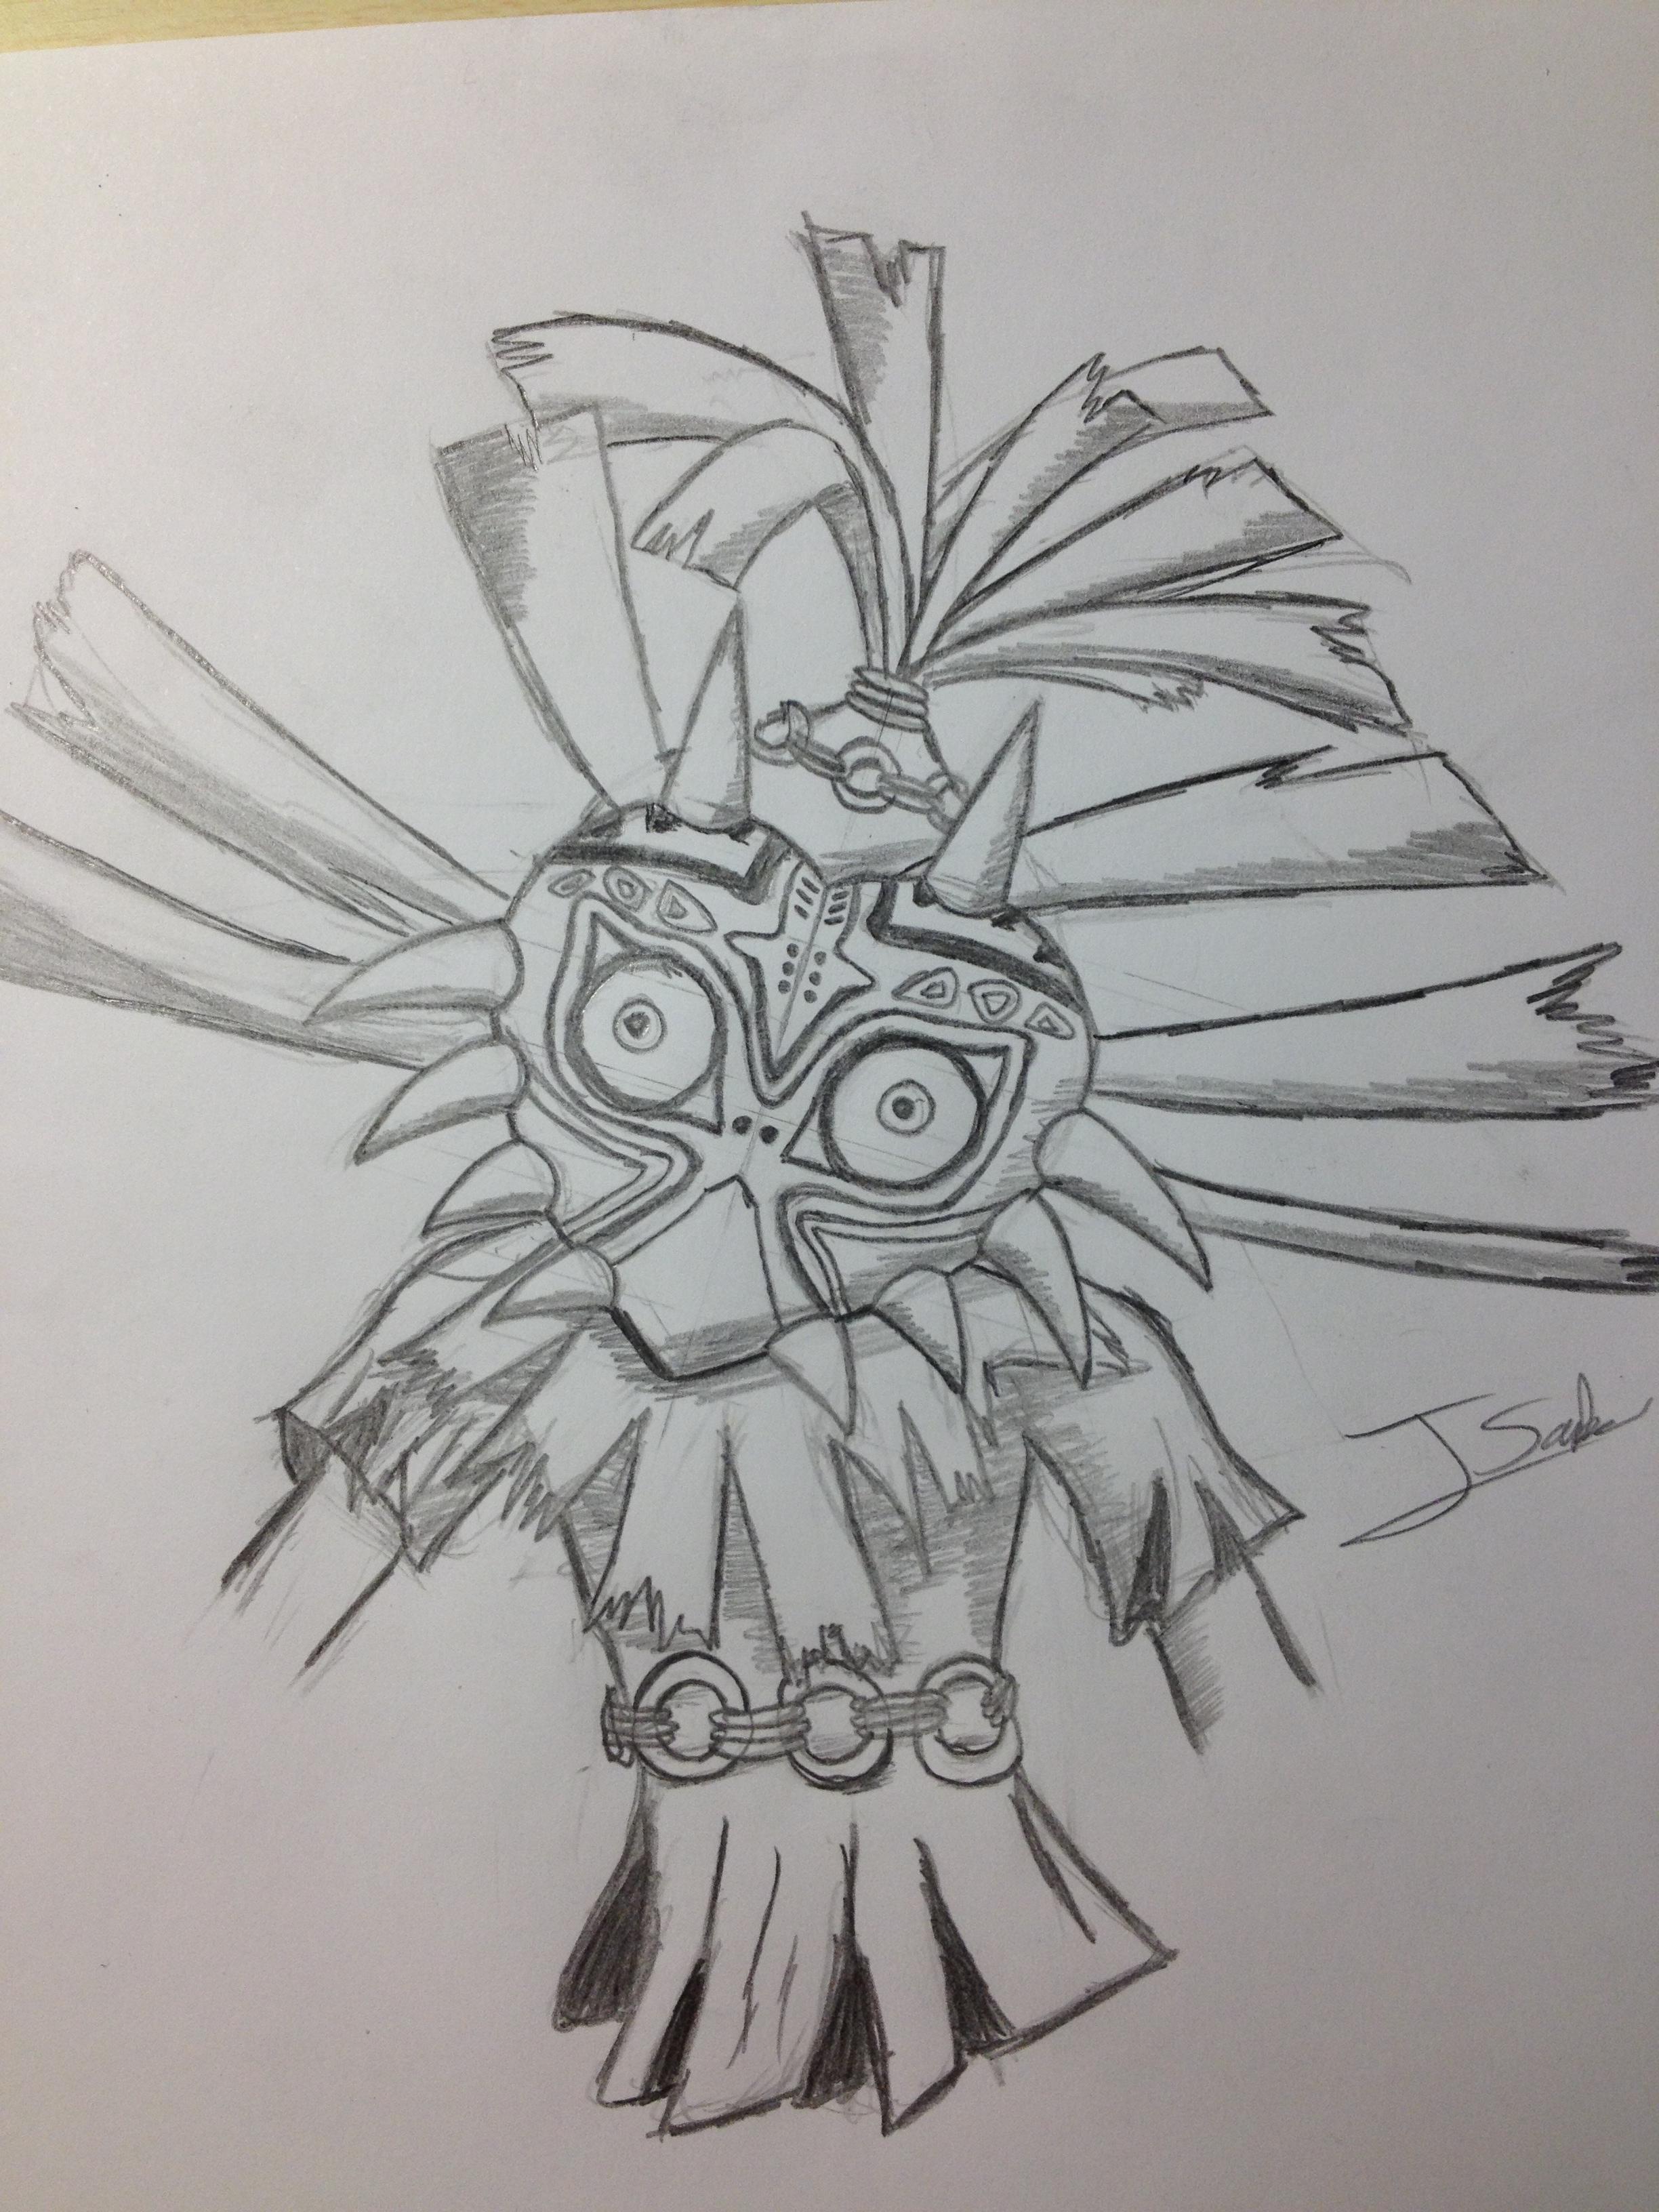 Skull Kid Majora's Mask